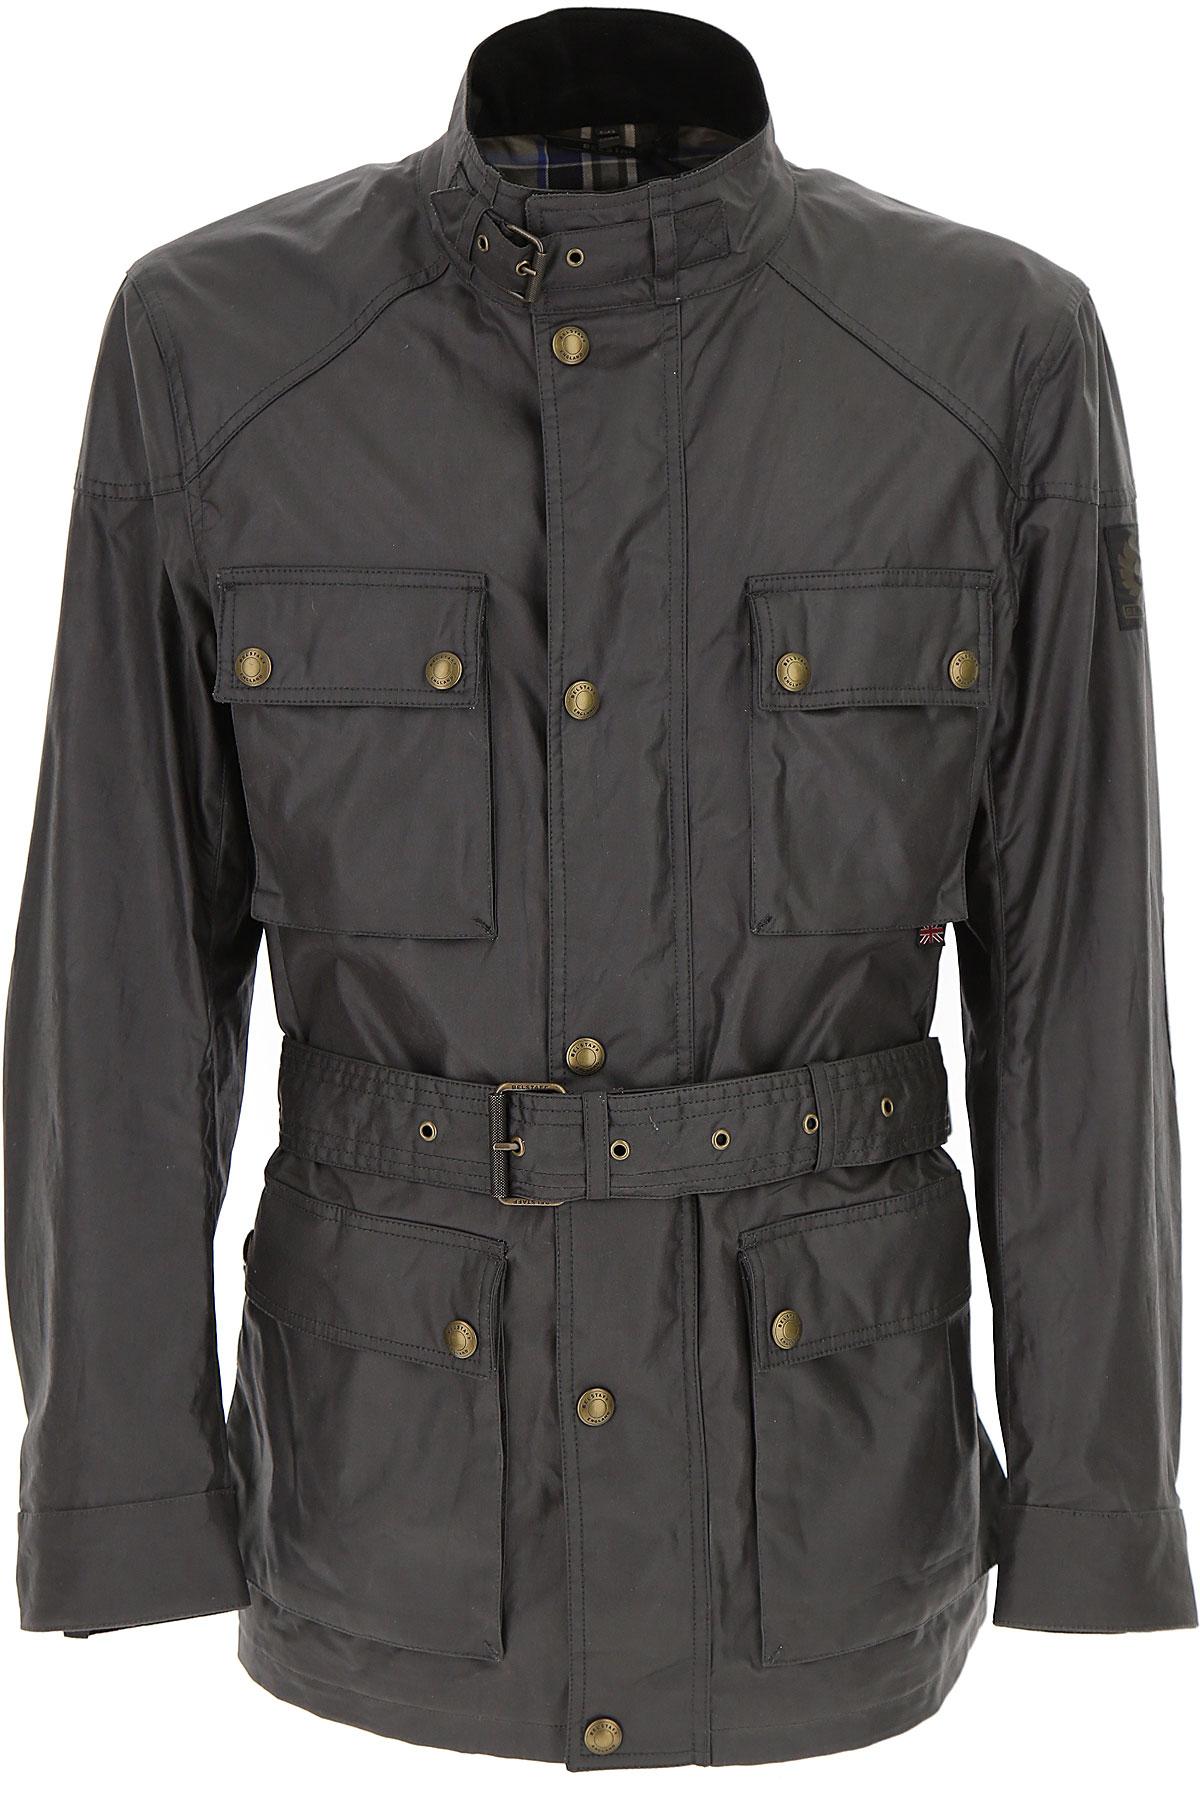 Image of Belstaff Men\'s Coat, Dark Anthracite Grey, polyester, 2017, L M XL XXL